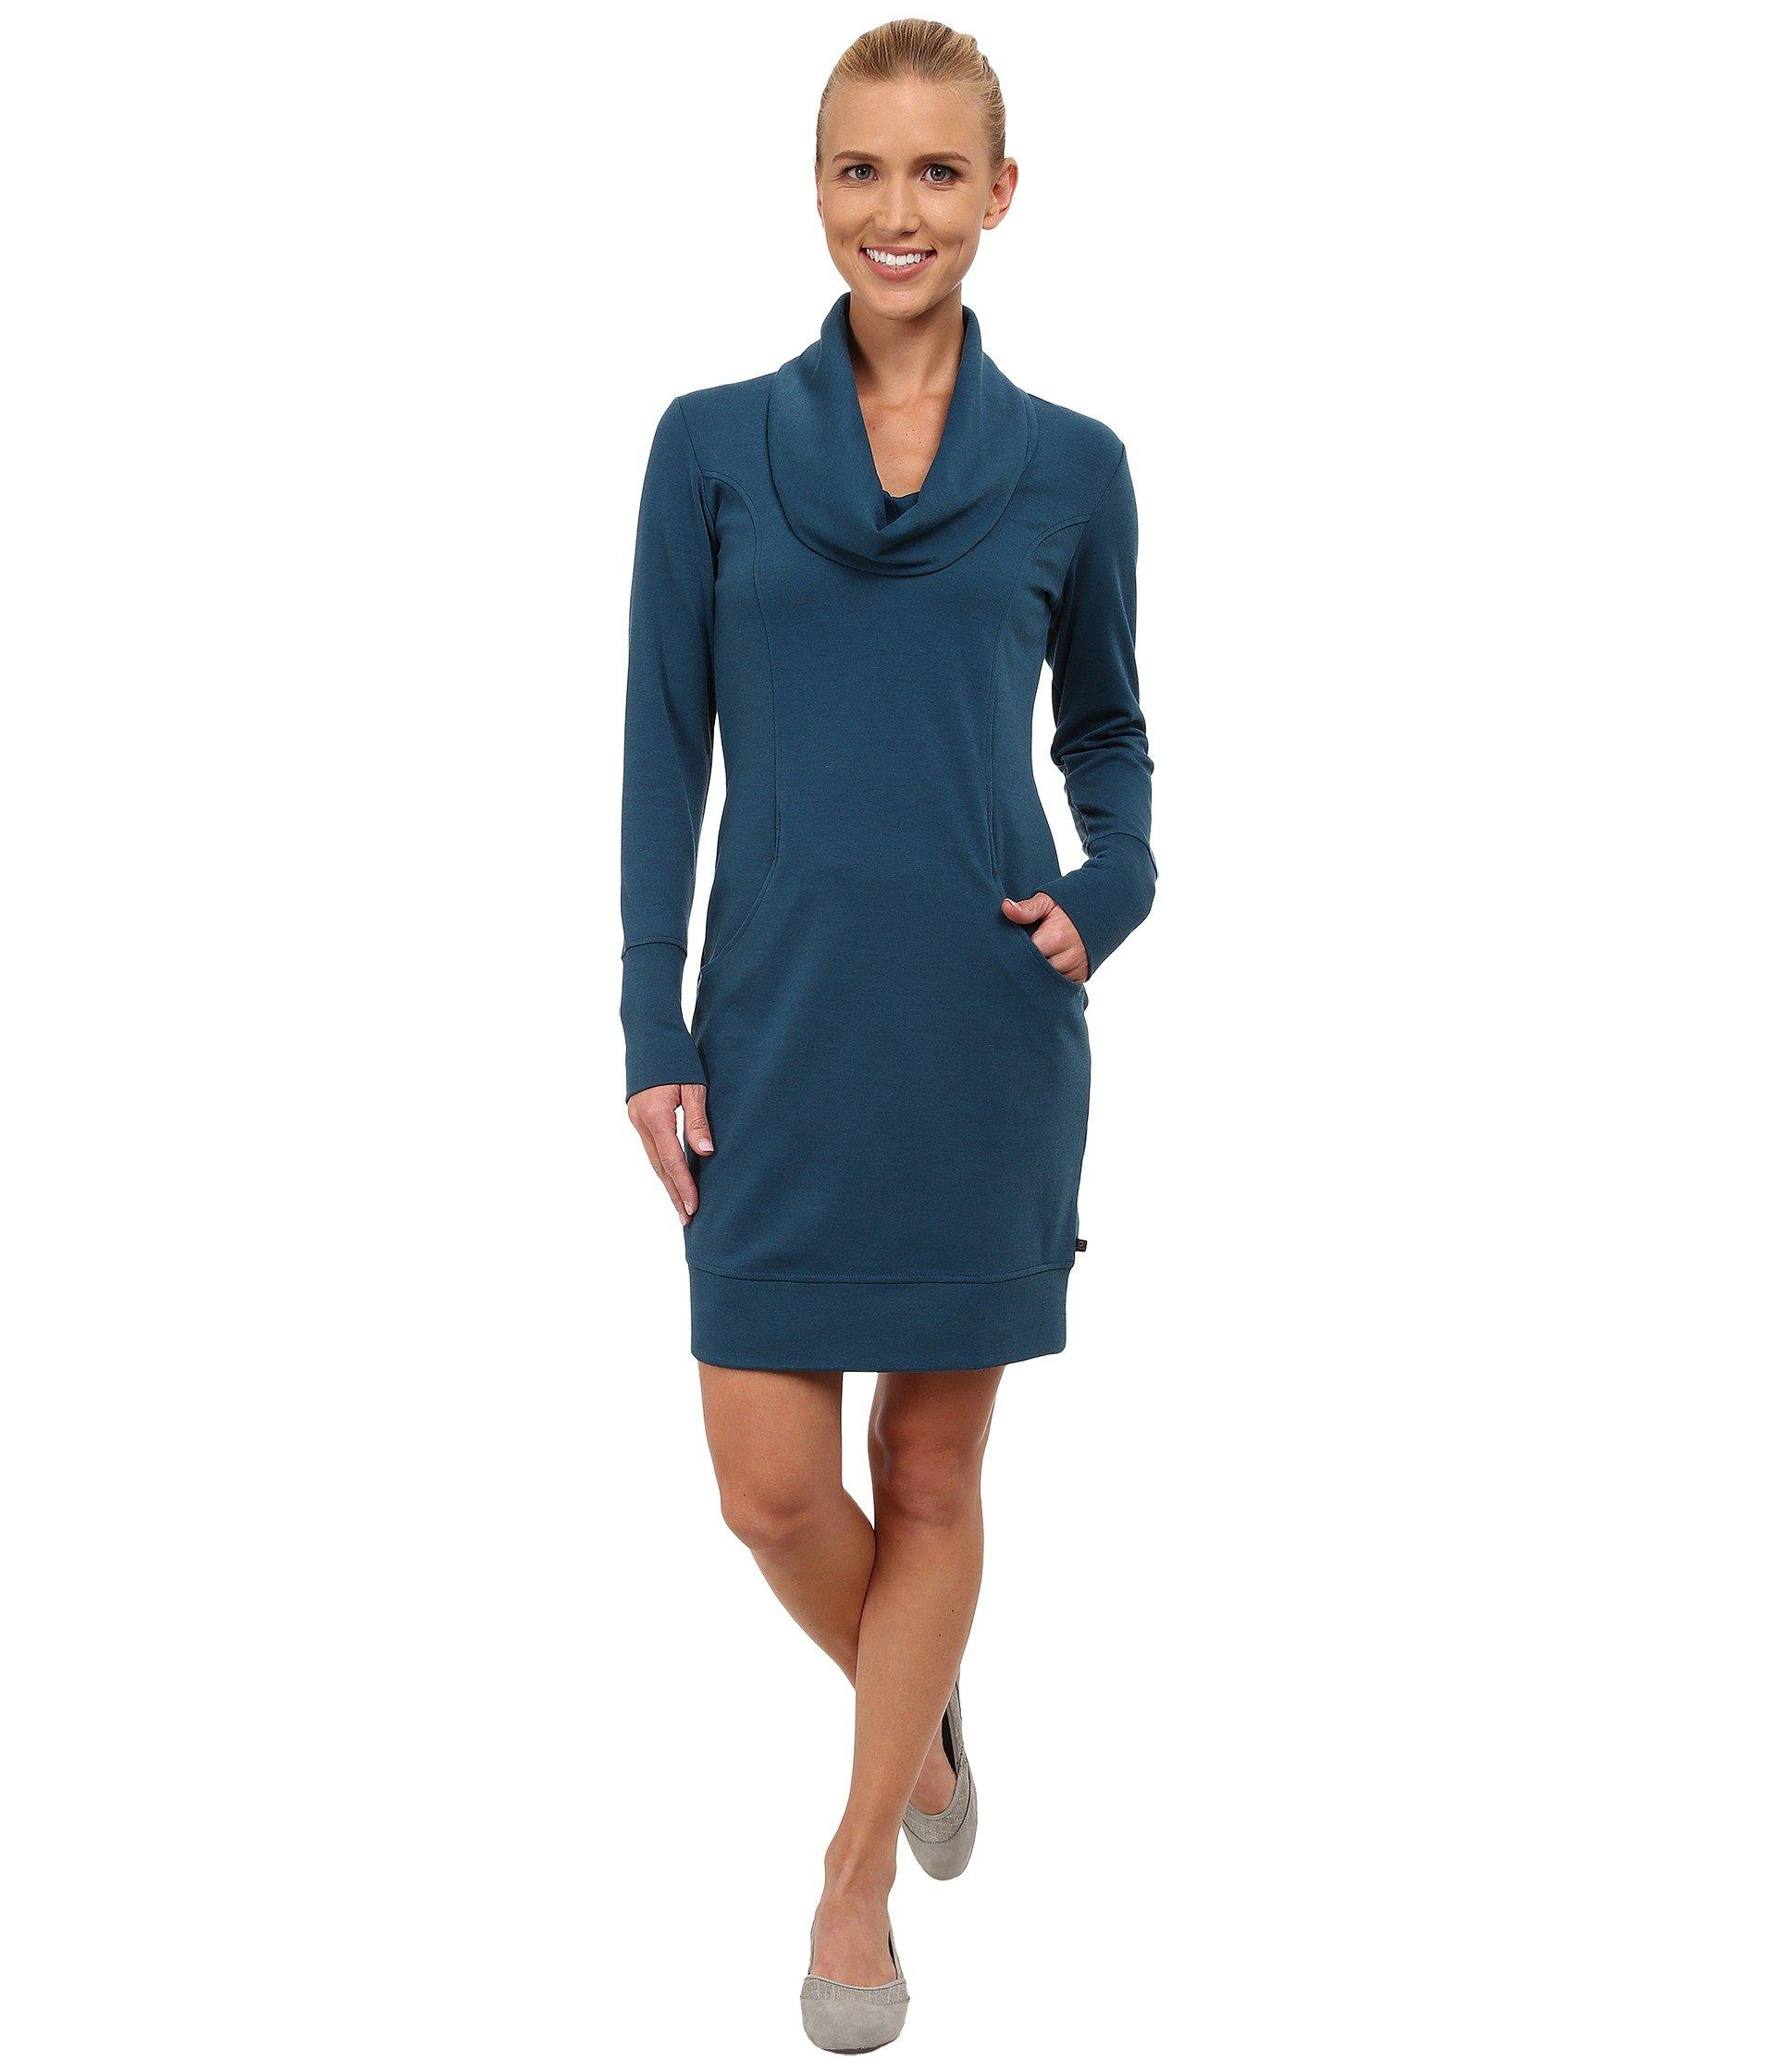 Merrell Indira Comfy Cowl Dress In Blue